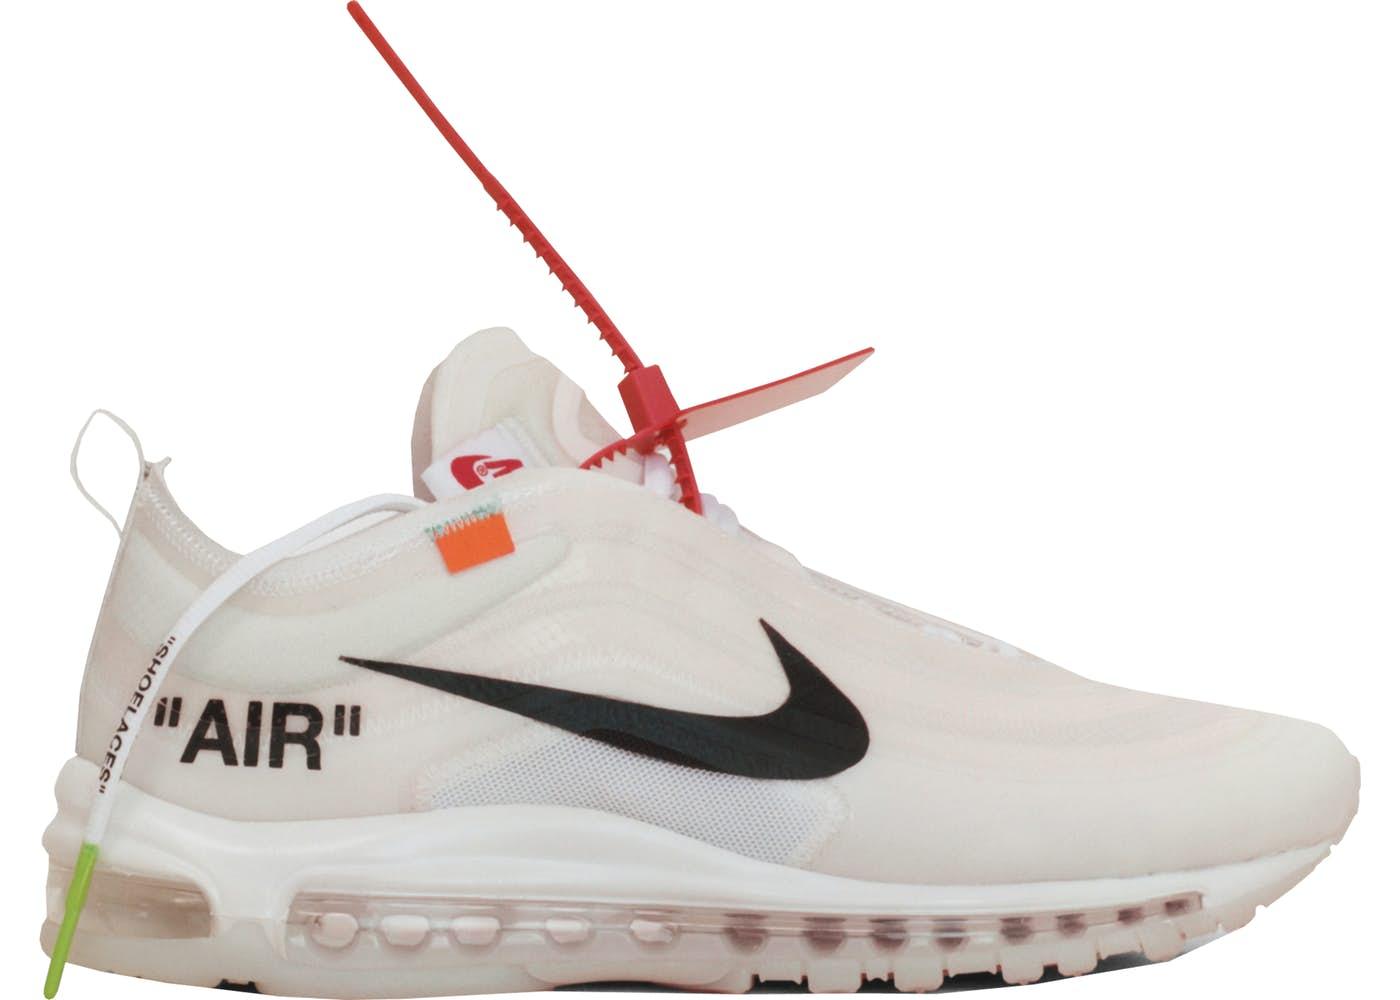 Air Max 97 Off-White(エアマックス97 オフホワイト)ホワイト/コーン-アイスブルー